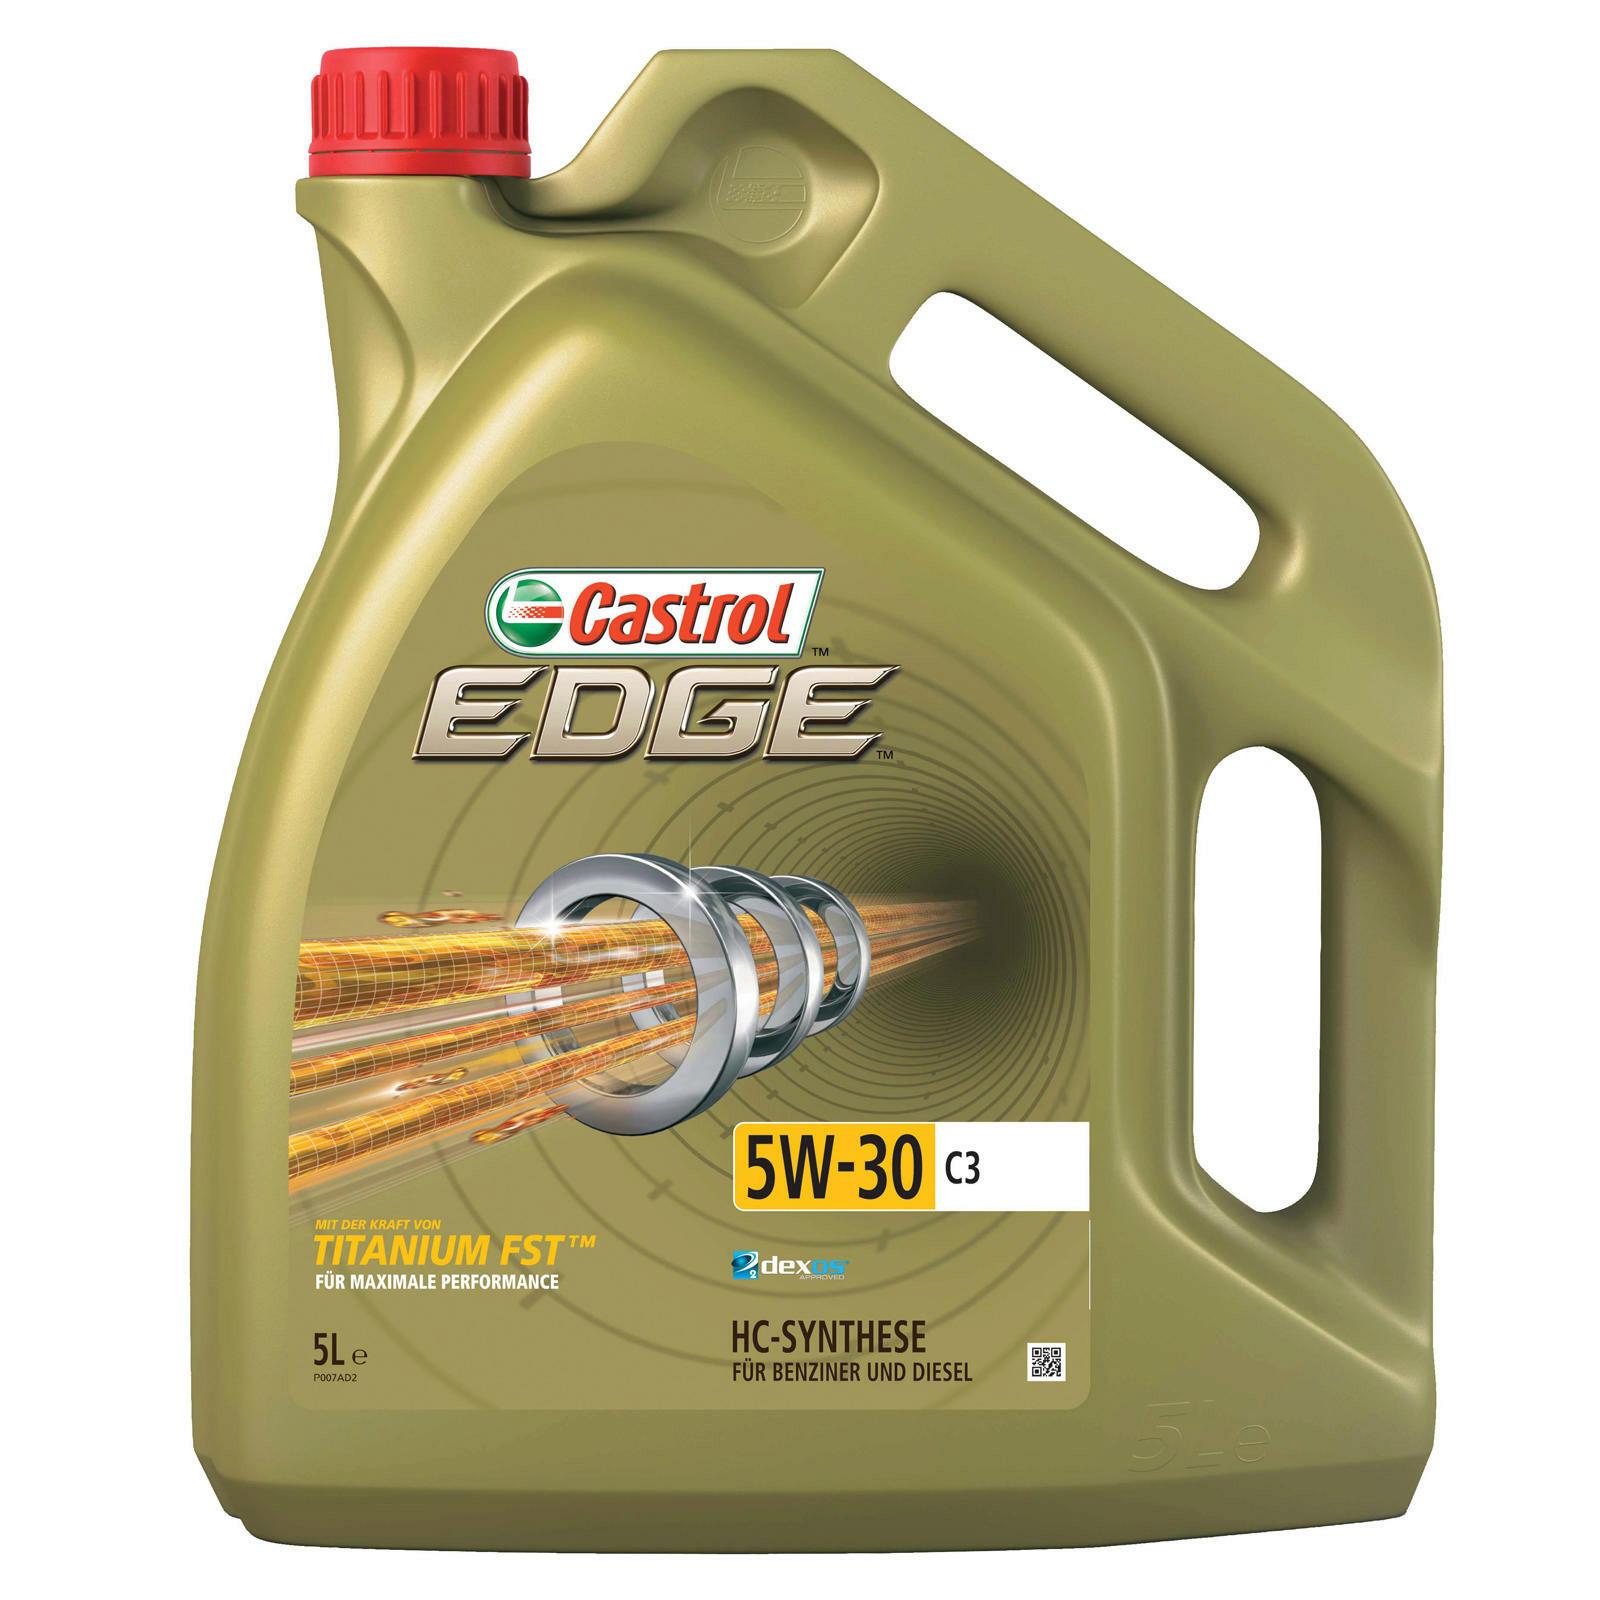 CASTROL Engine Oil EDGE 5W-30